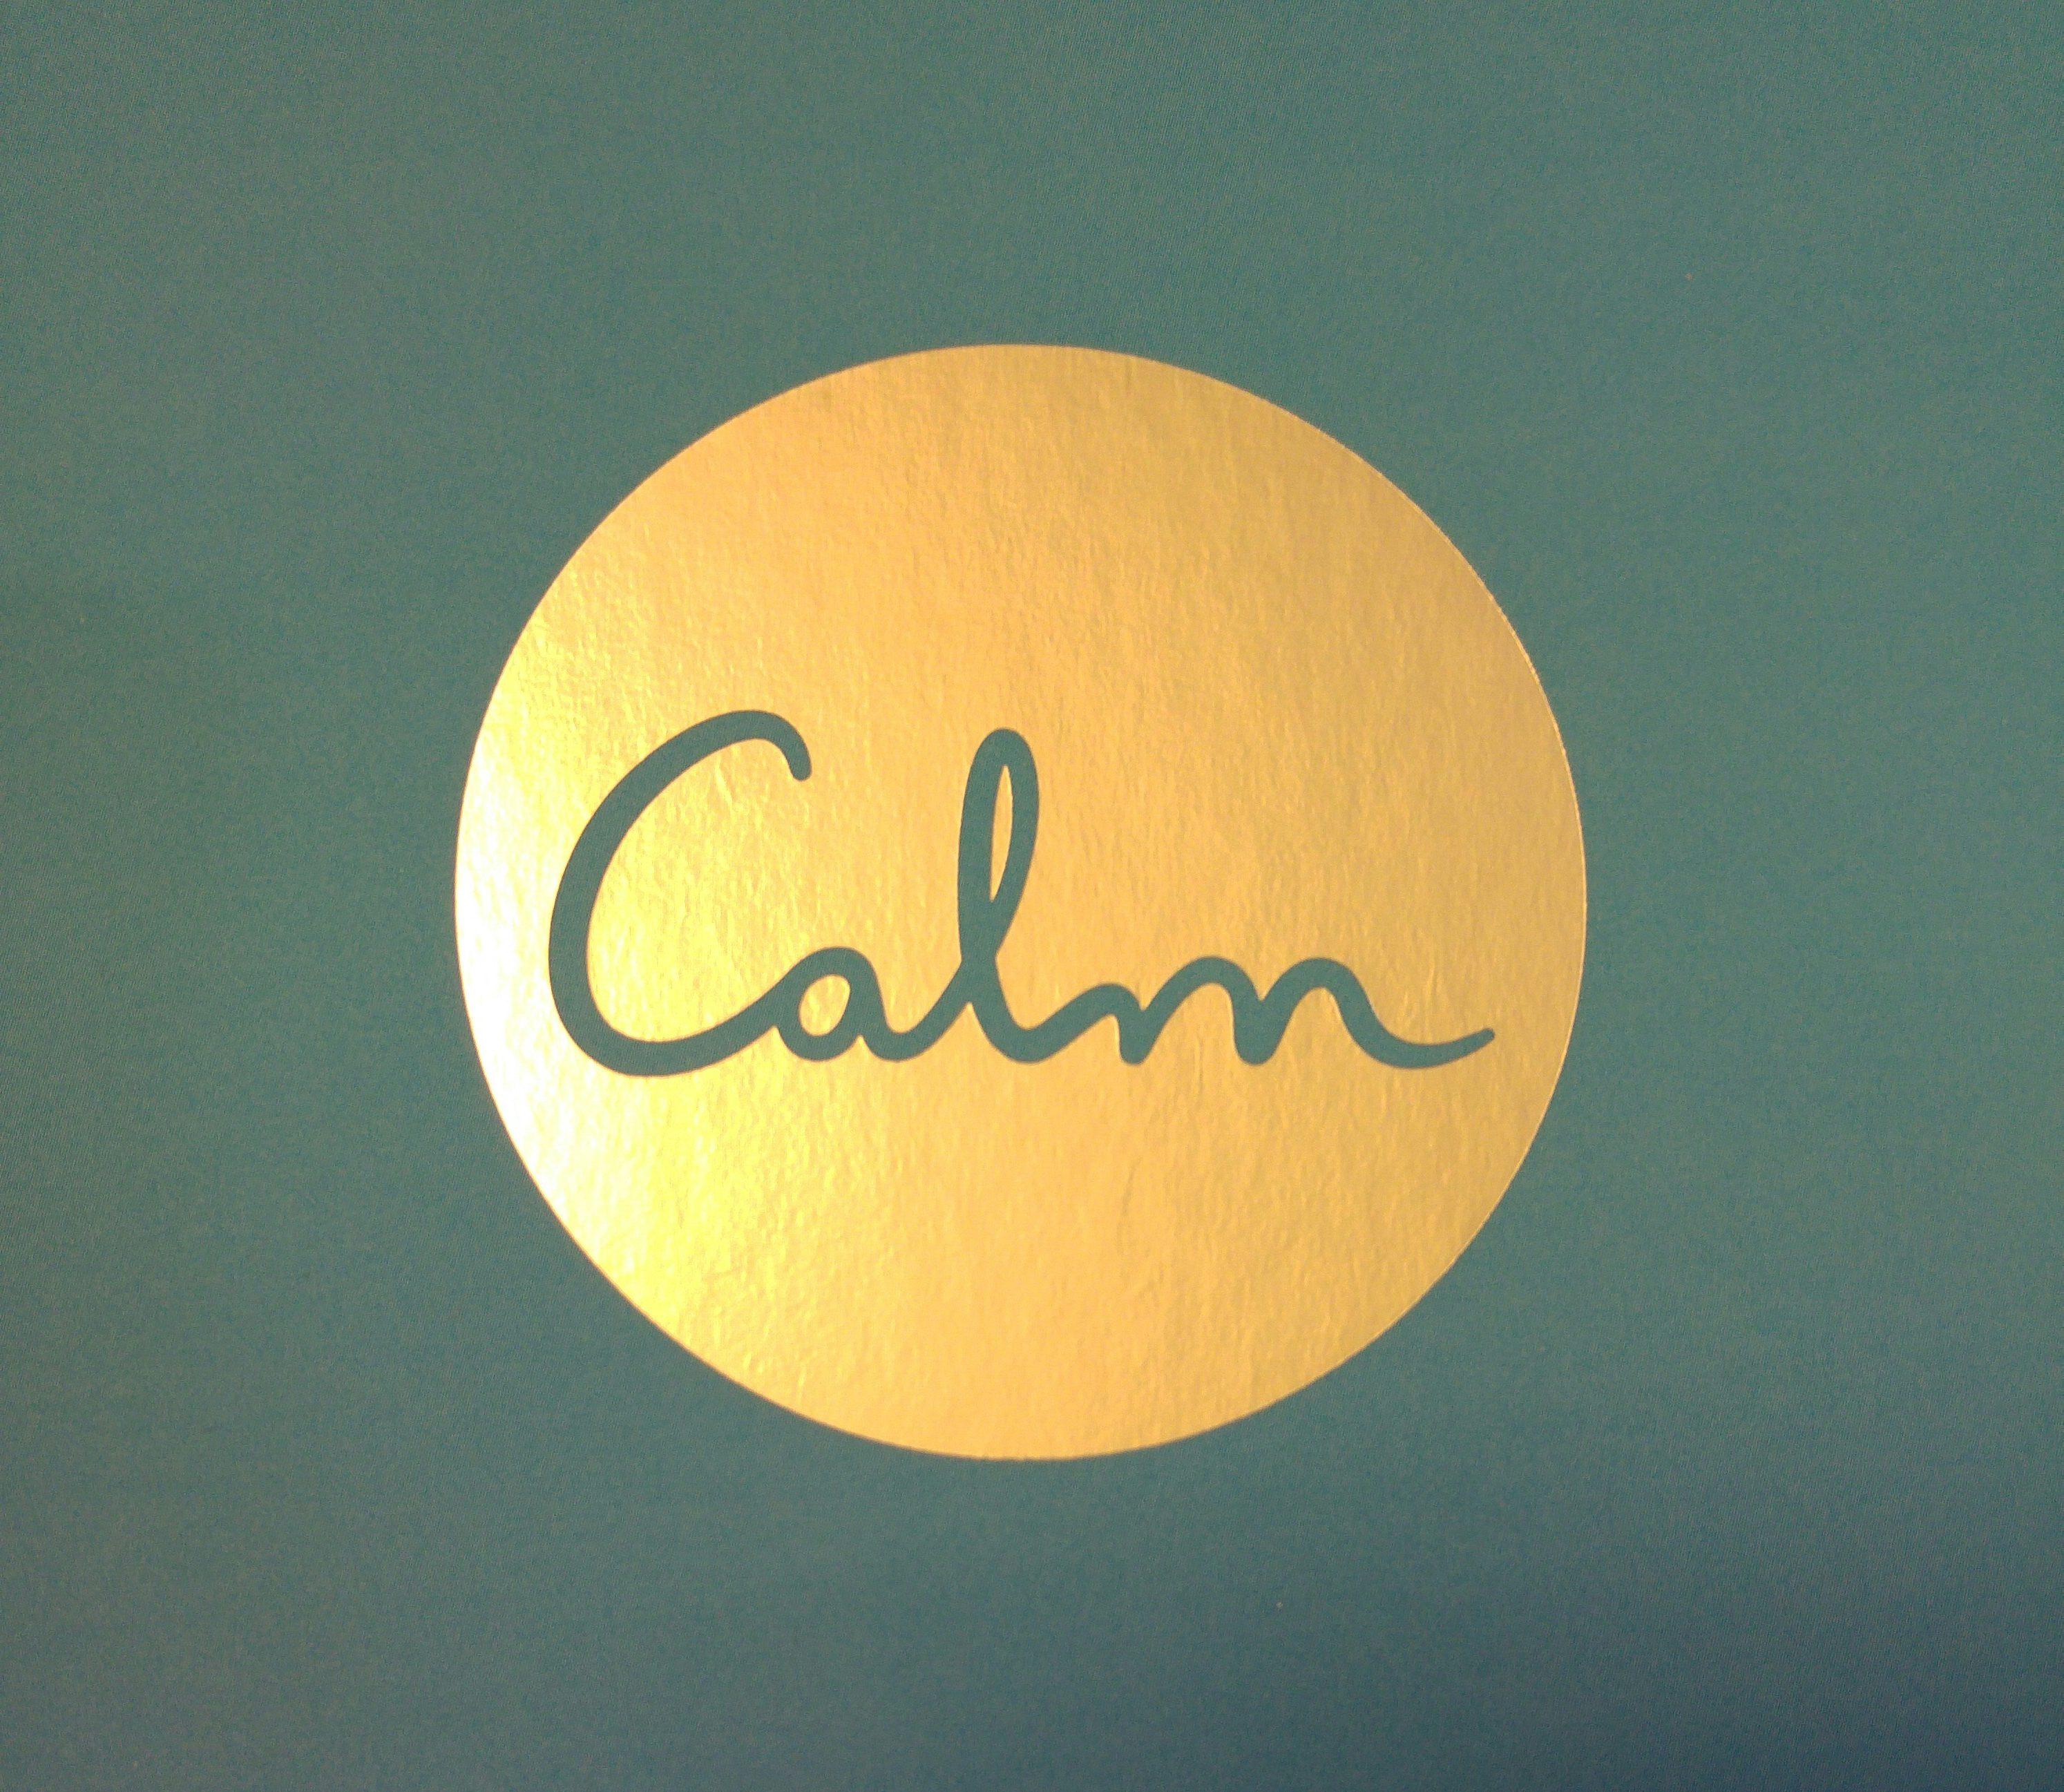 2016 06 01 calm 0